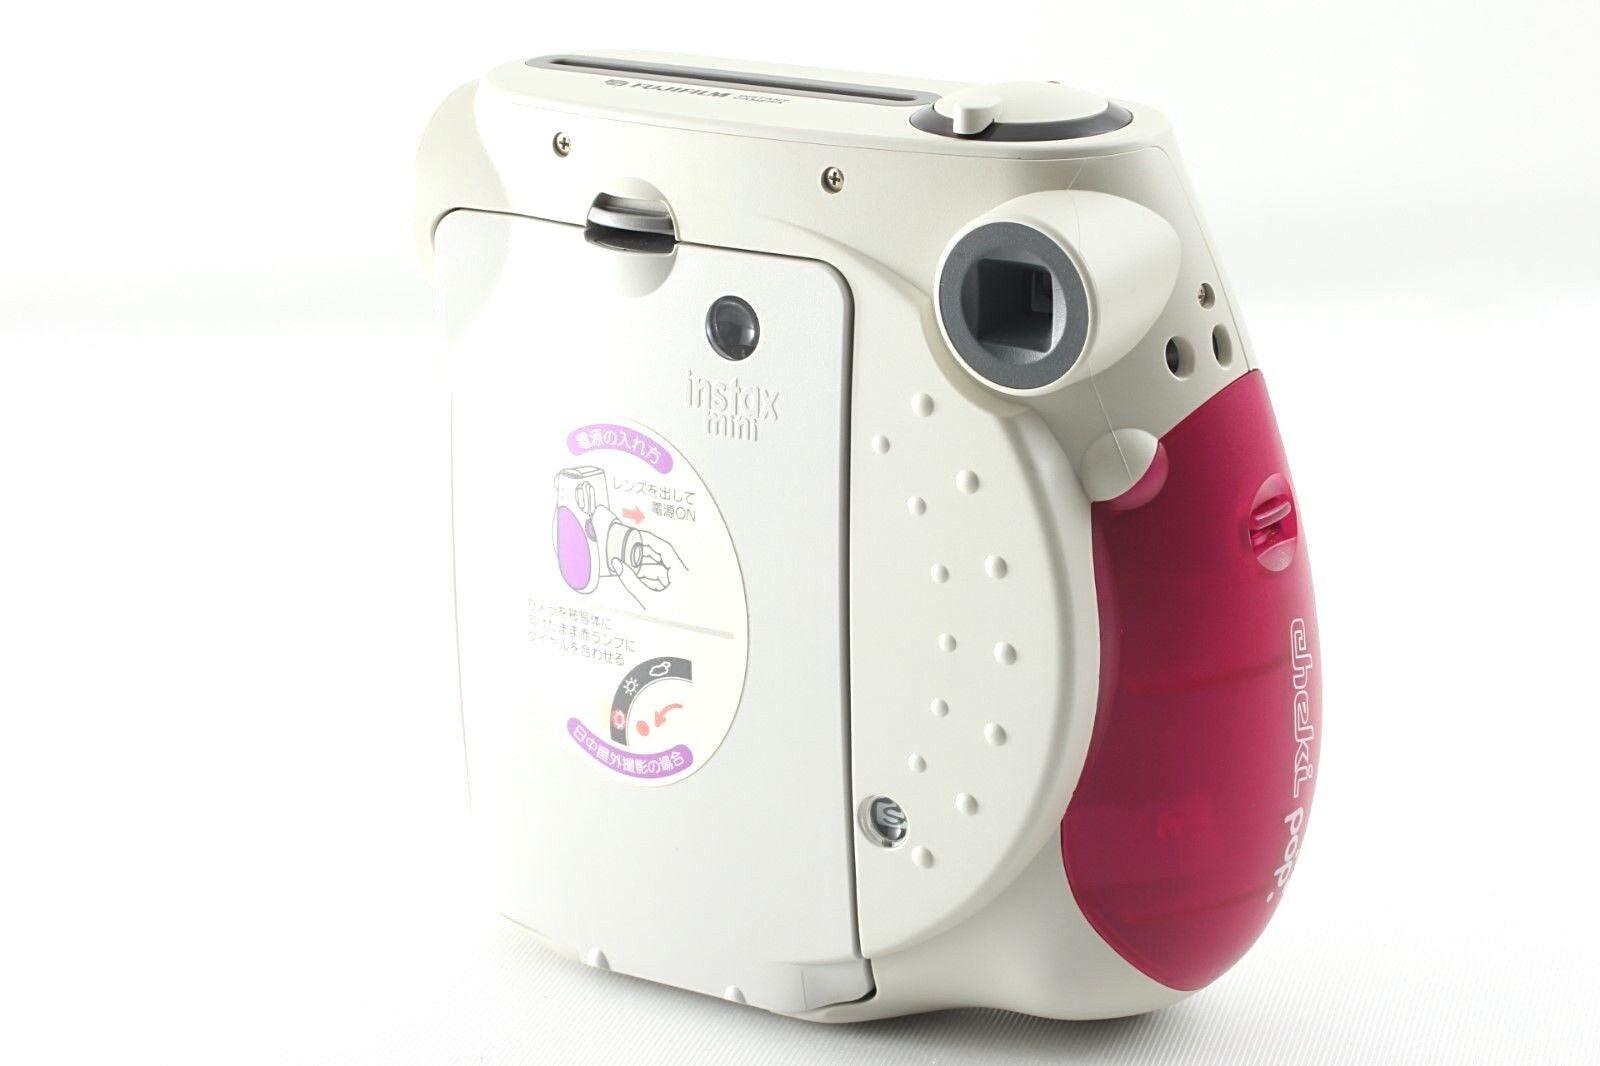 Polaroid Camera Urban Outfitters : Instax mini camera urban outfitters hello kitty polaroid camera